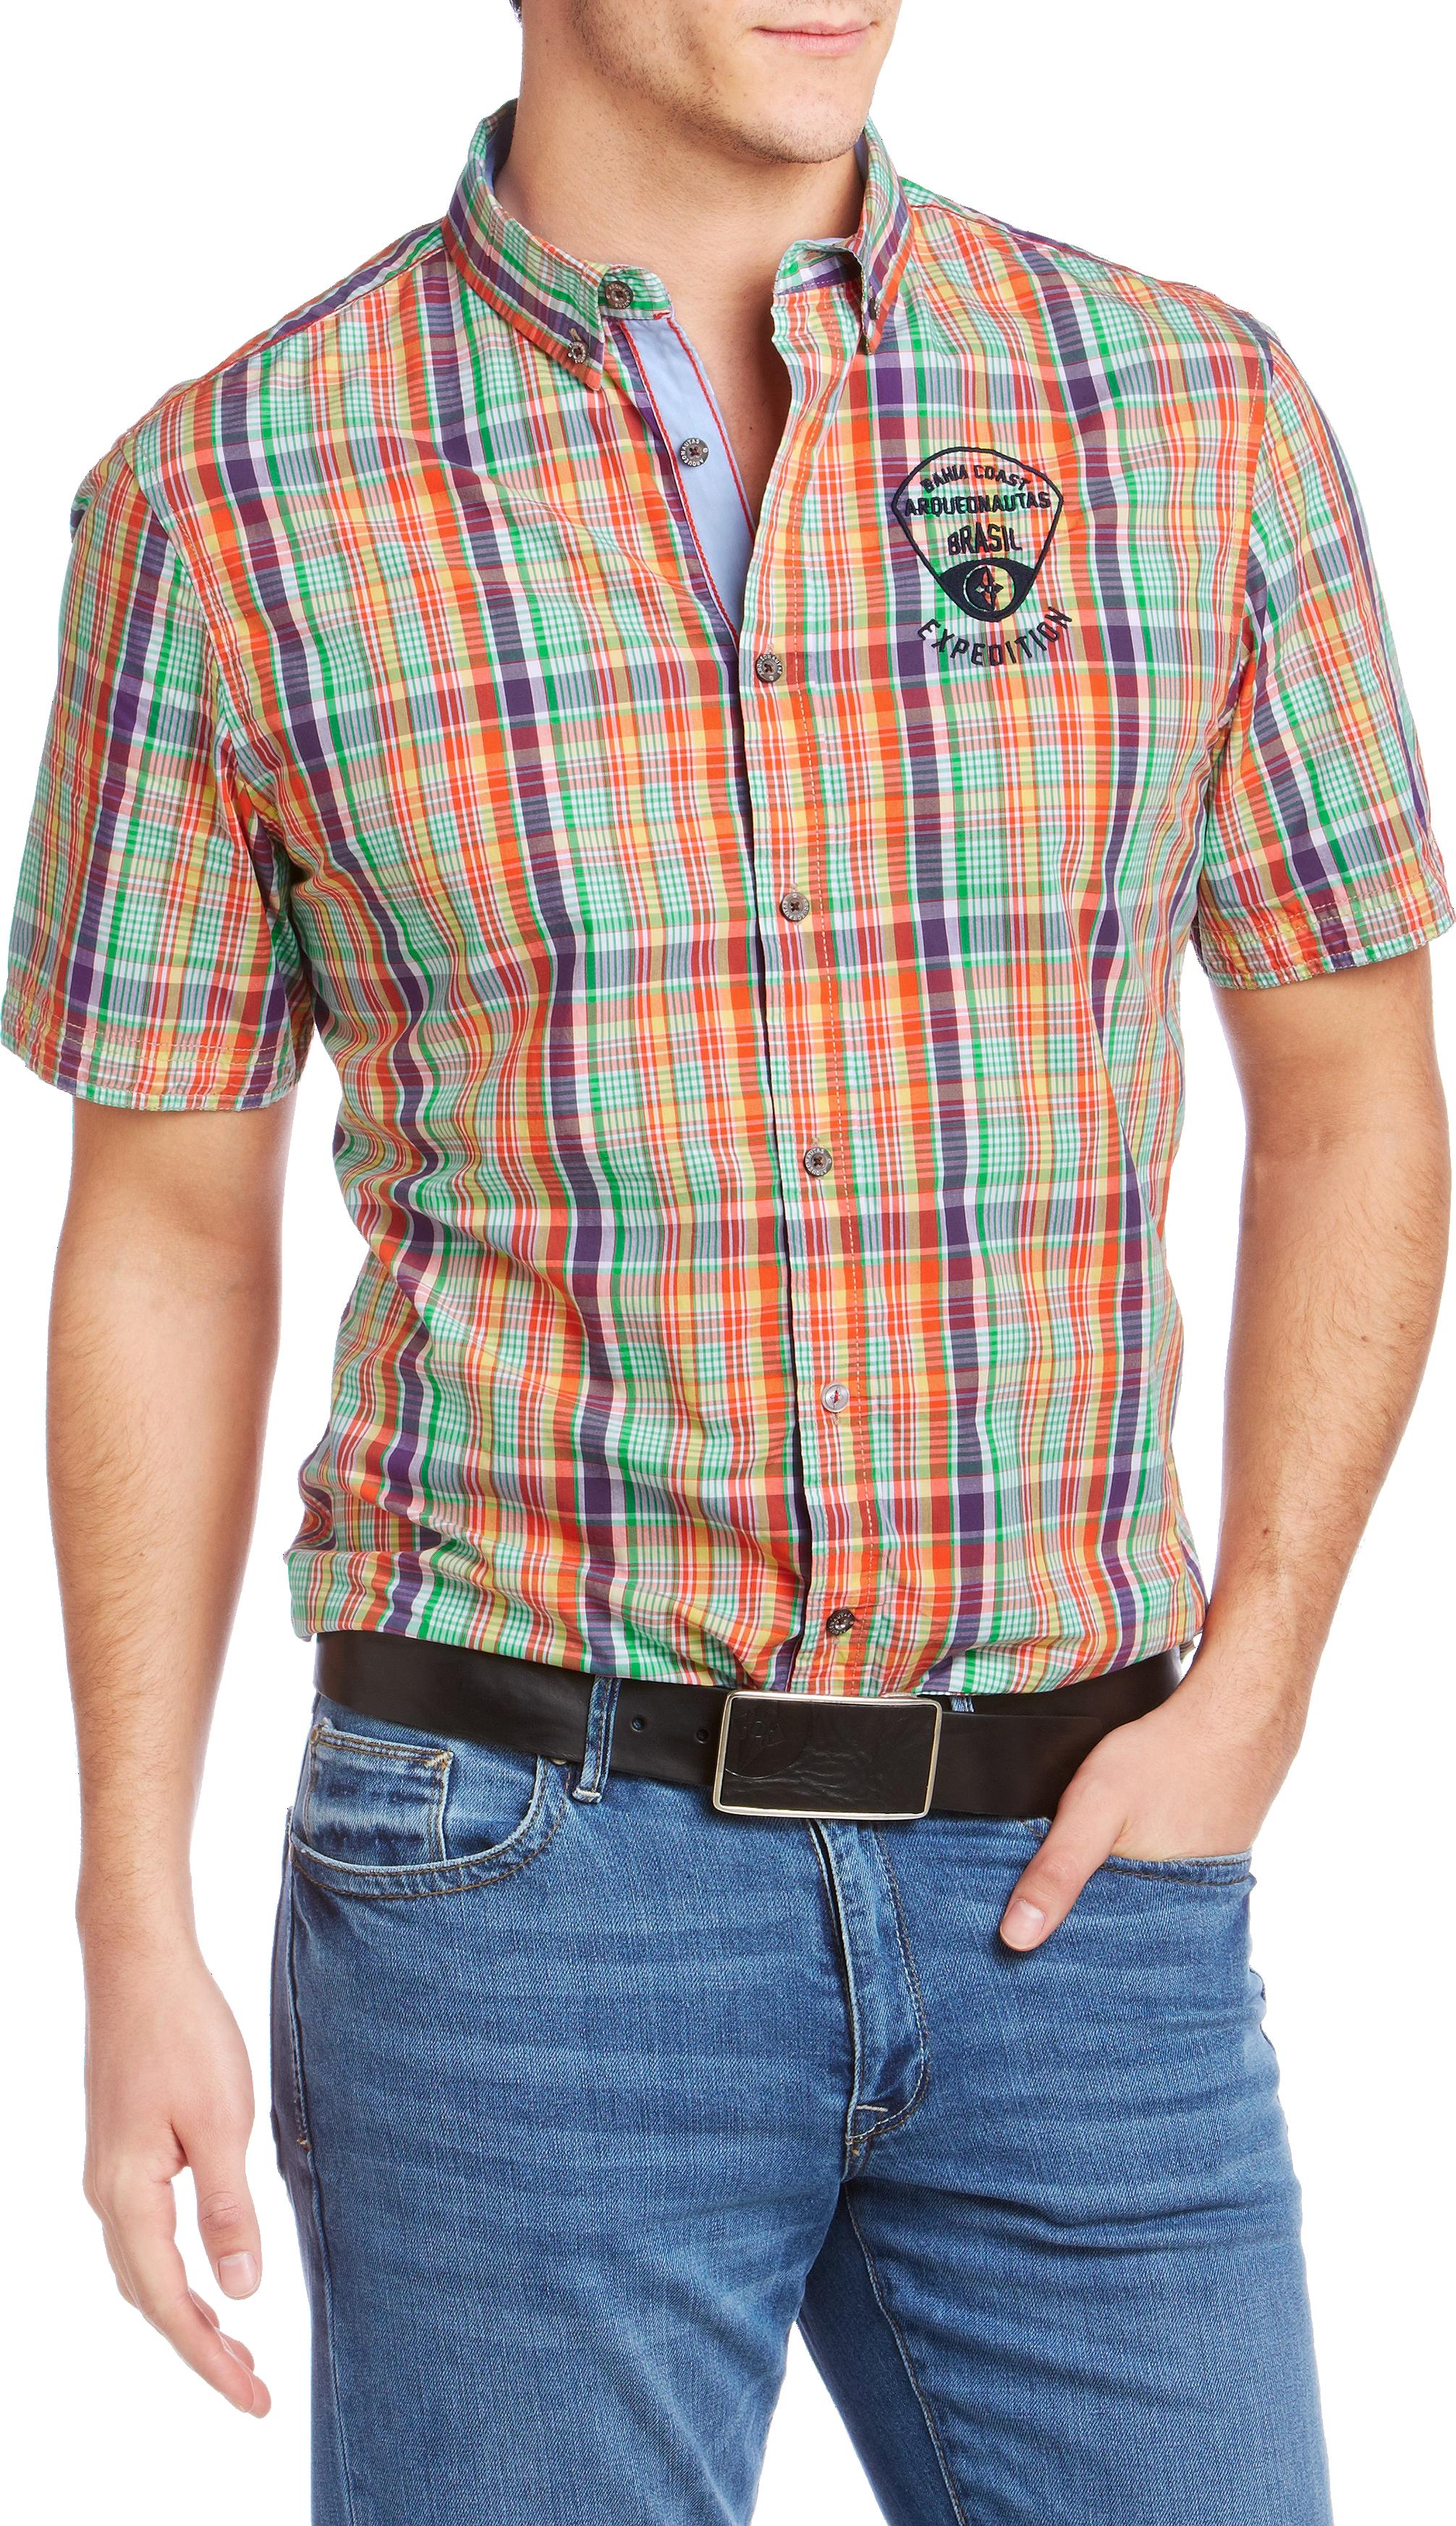 Men polo shirt PNG image